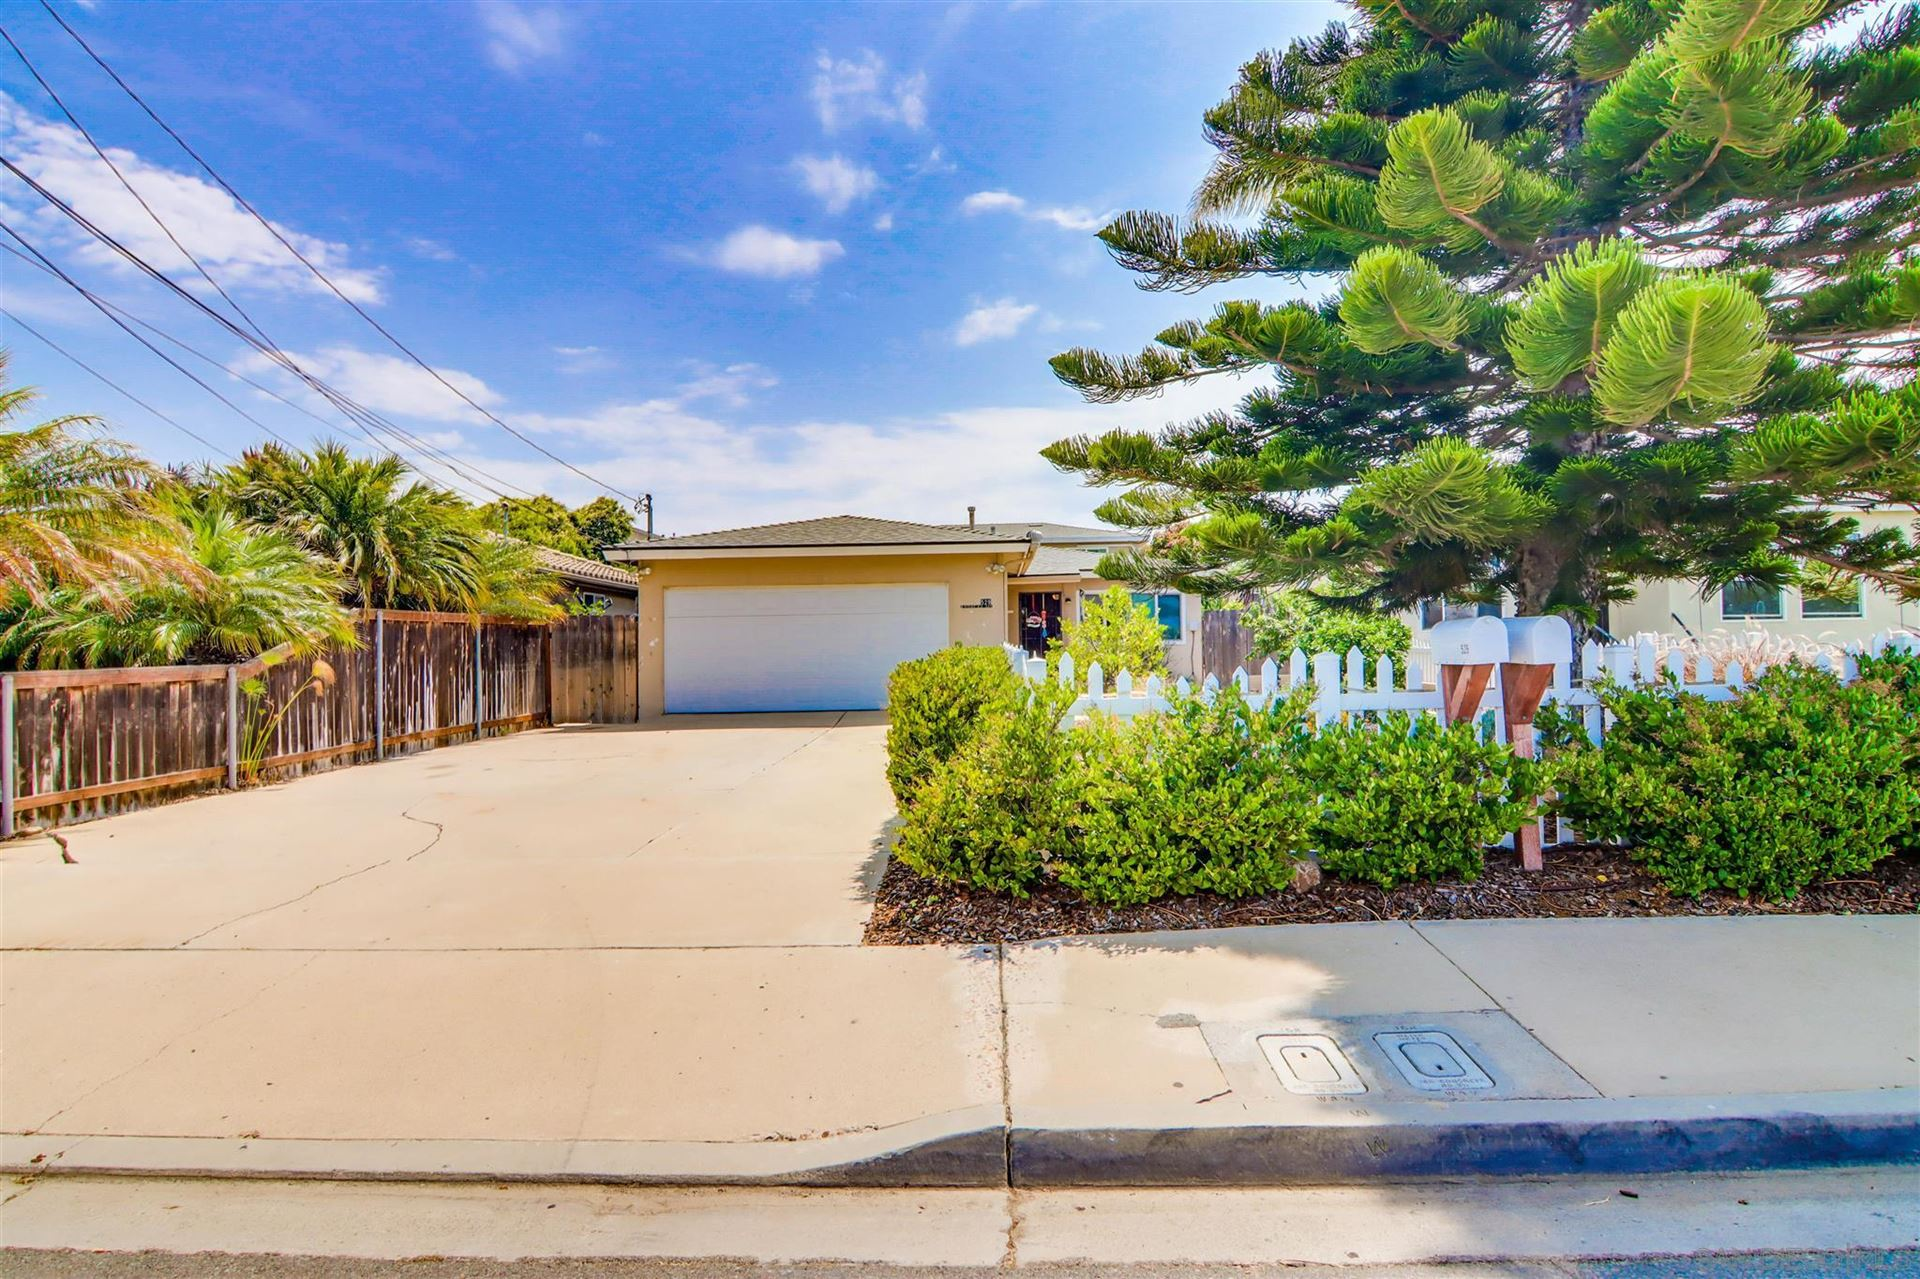 Photo of 529-531 Emory, Imperial Beach, CA 91932 (MLS # 210020583)